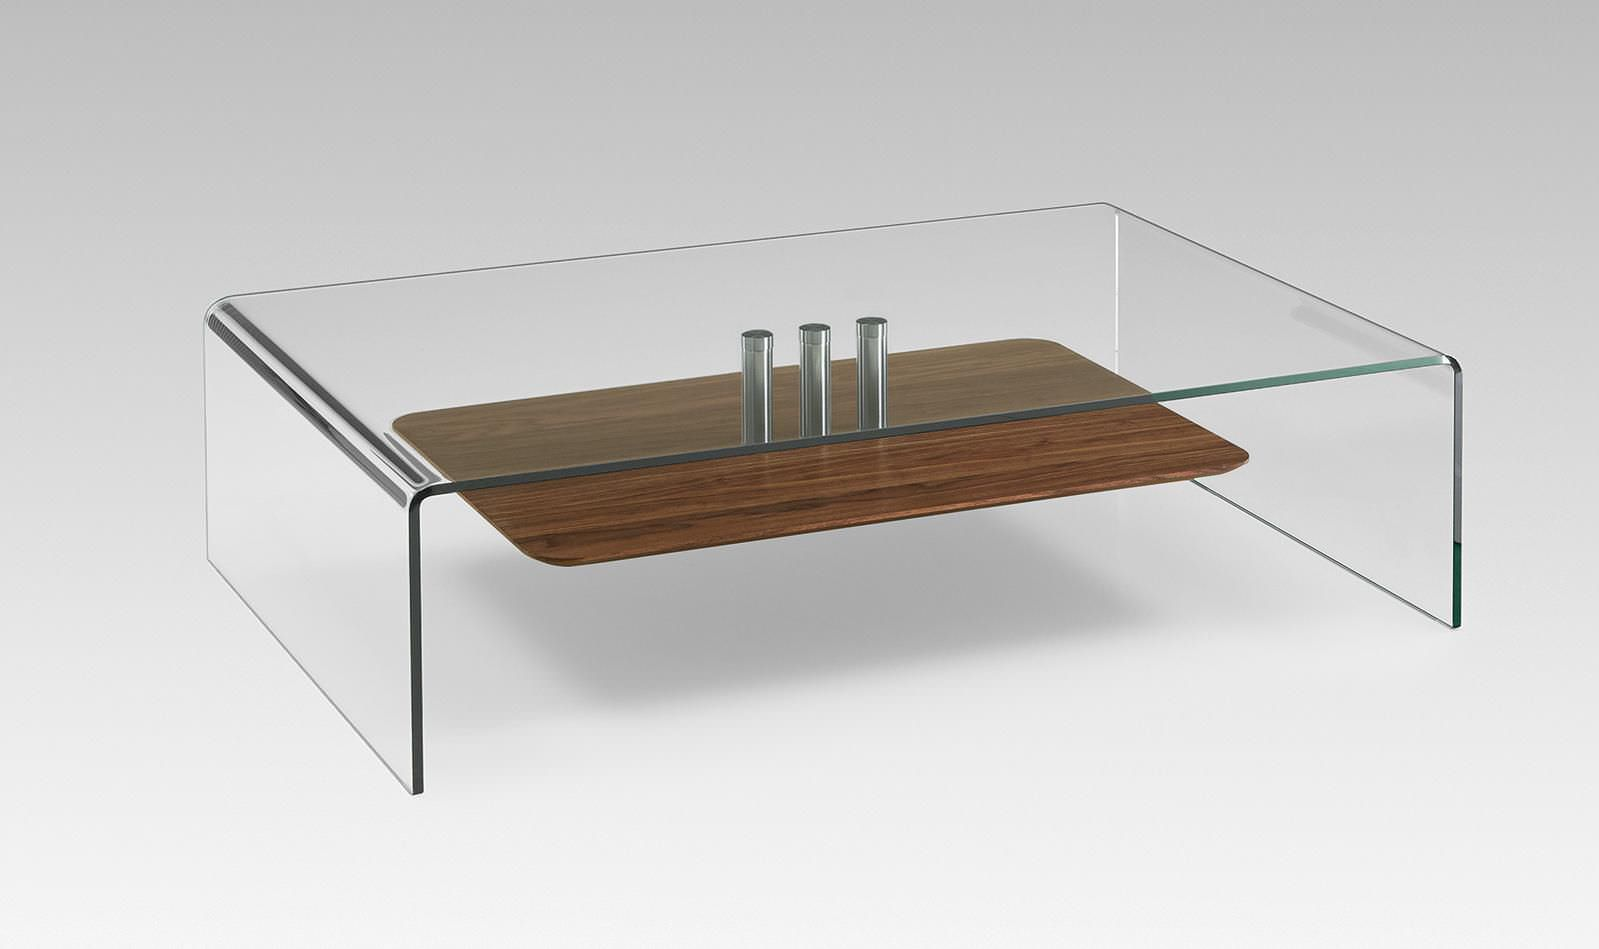 Moderner Couchtisch Holz Glas Rechteckig 4618 Alfons